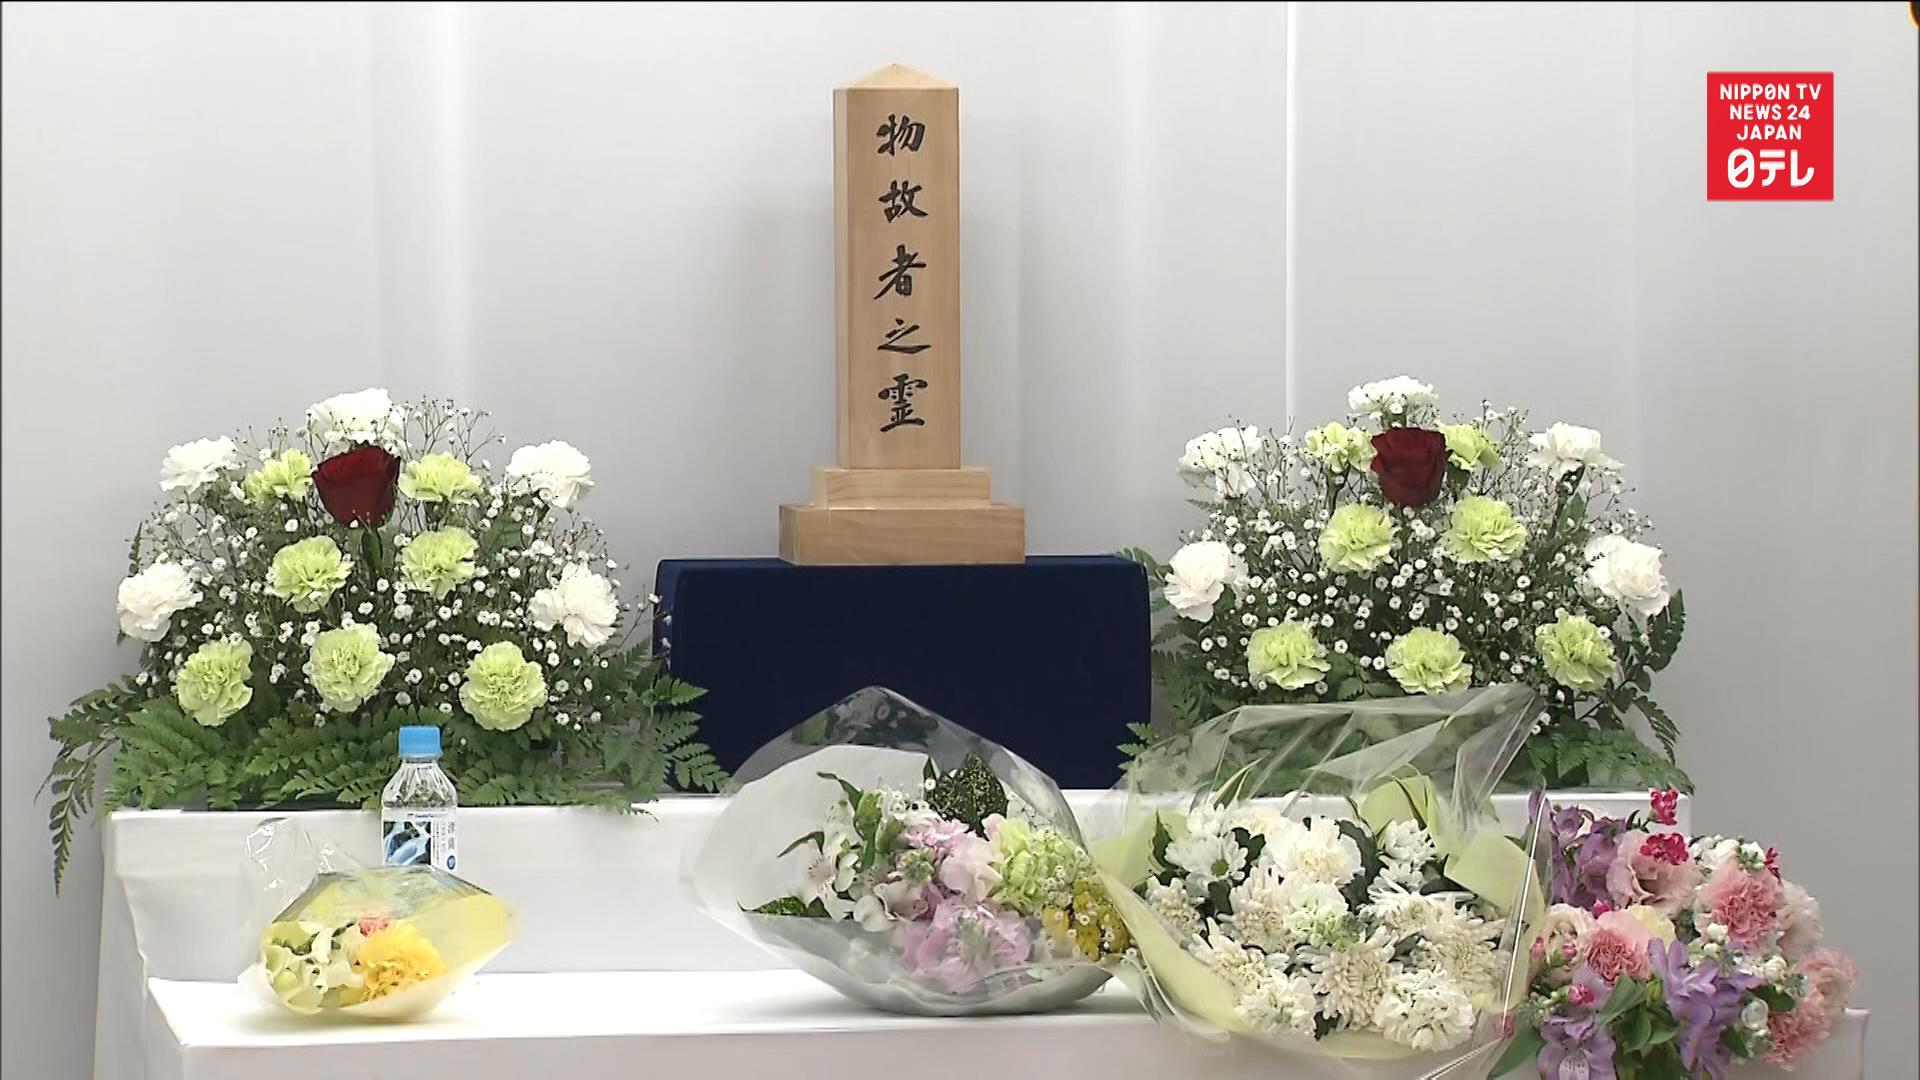 25 years since sarin terror attacks in Tokyo